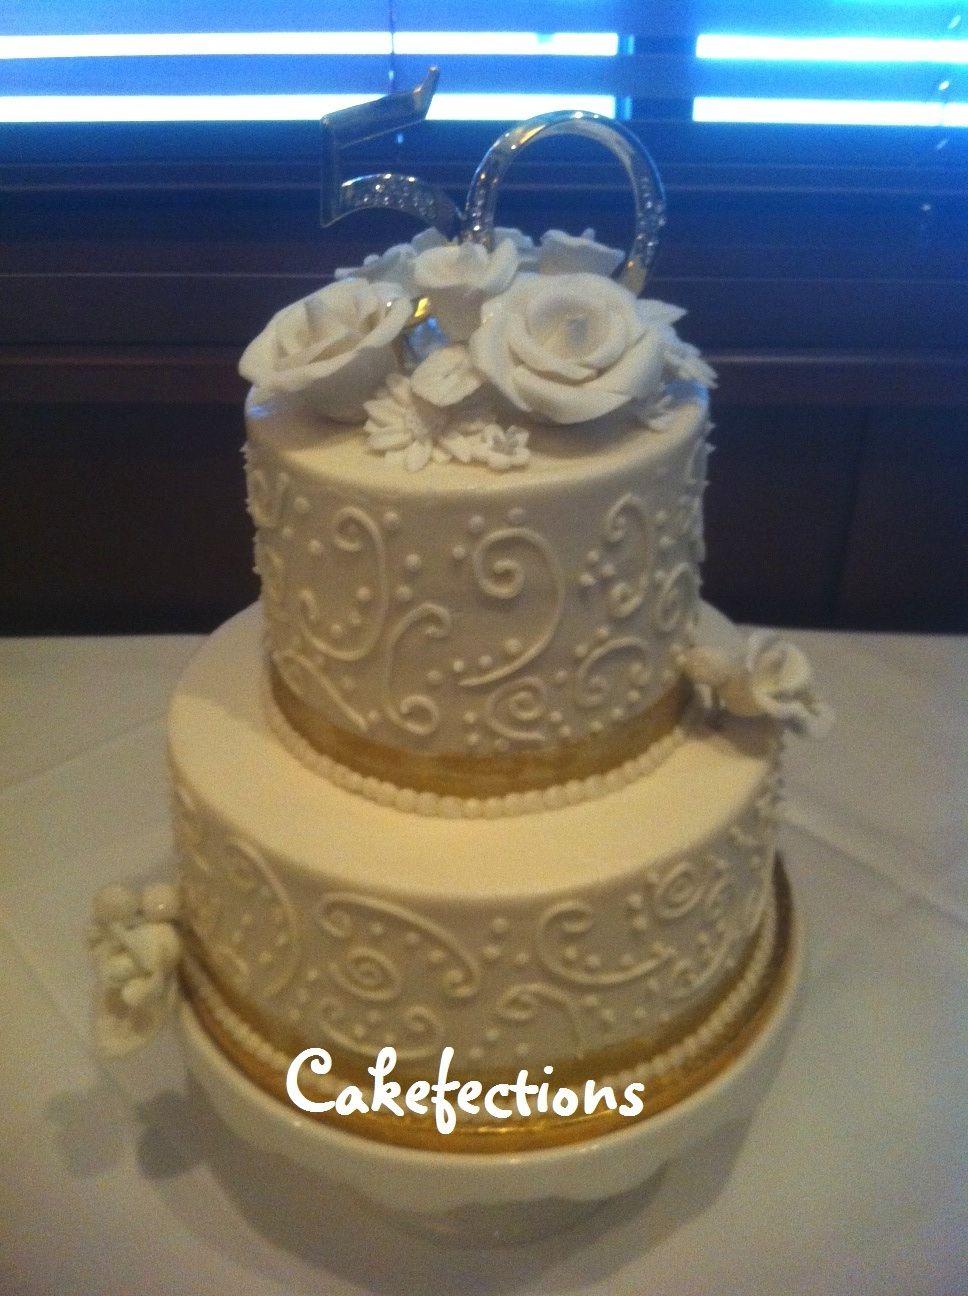 50th Anniversary Cake Buttercream Cake Wedding Cake Bakery Cake Decorating Designs